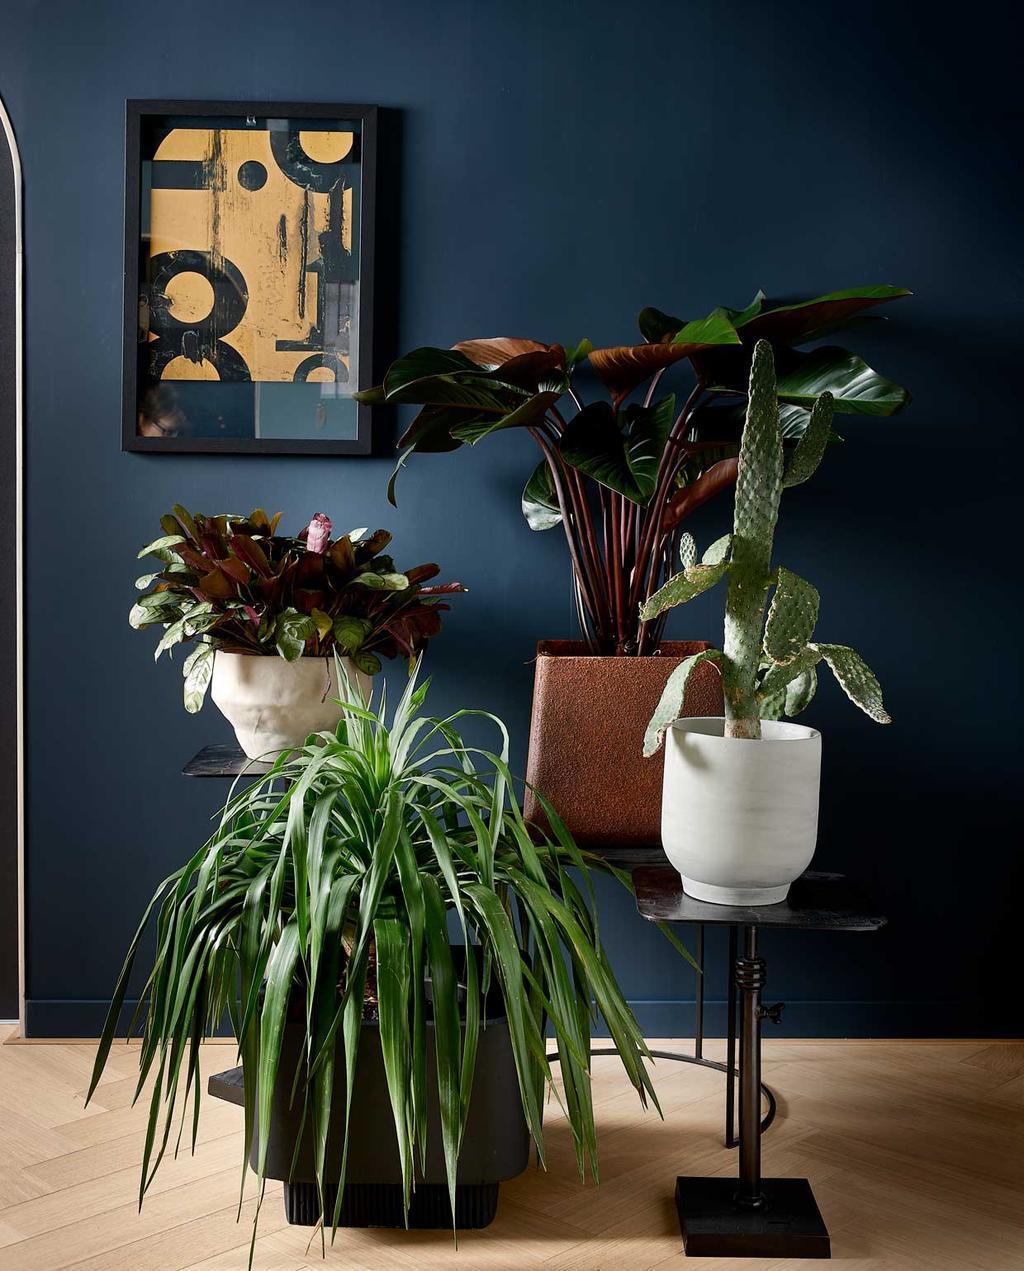 vtwonen 01-2021 | styling natuur in huis woonkamer